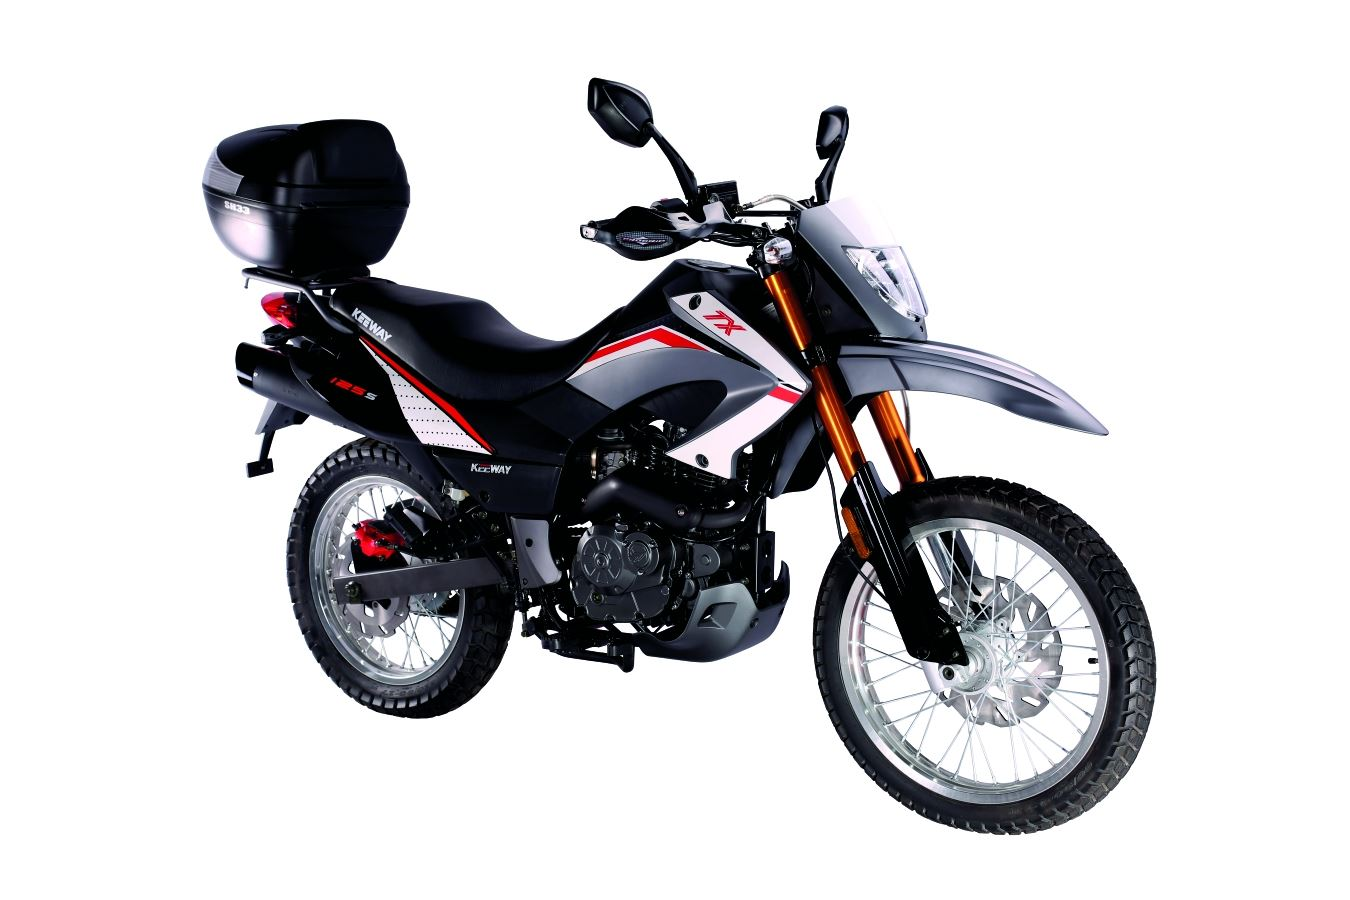 keeway tx enduro 125 moto moto 125 andar de moto. Black Bedroom Furniture Sets. Home Design Ideas